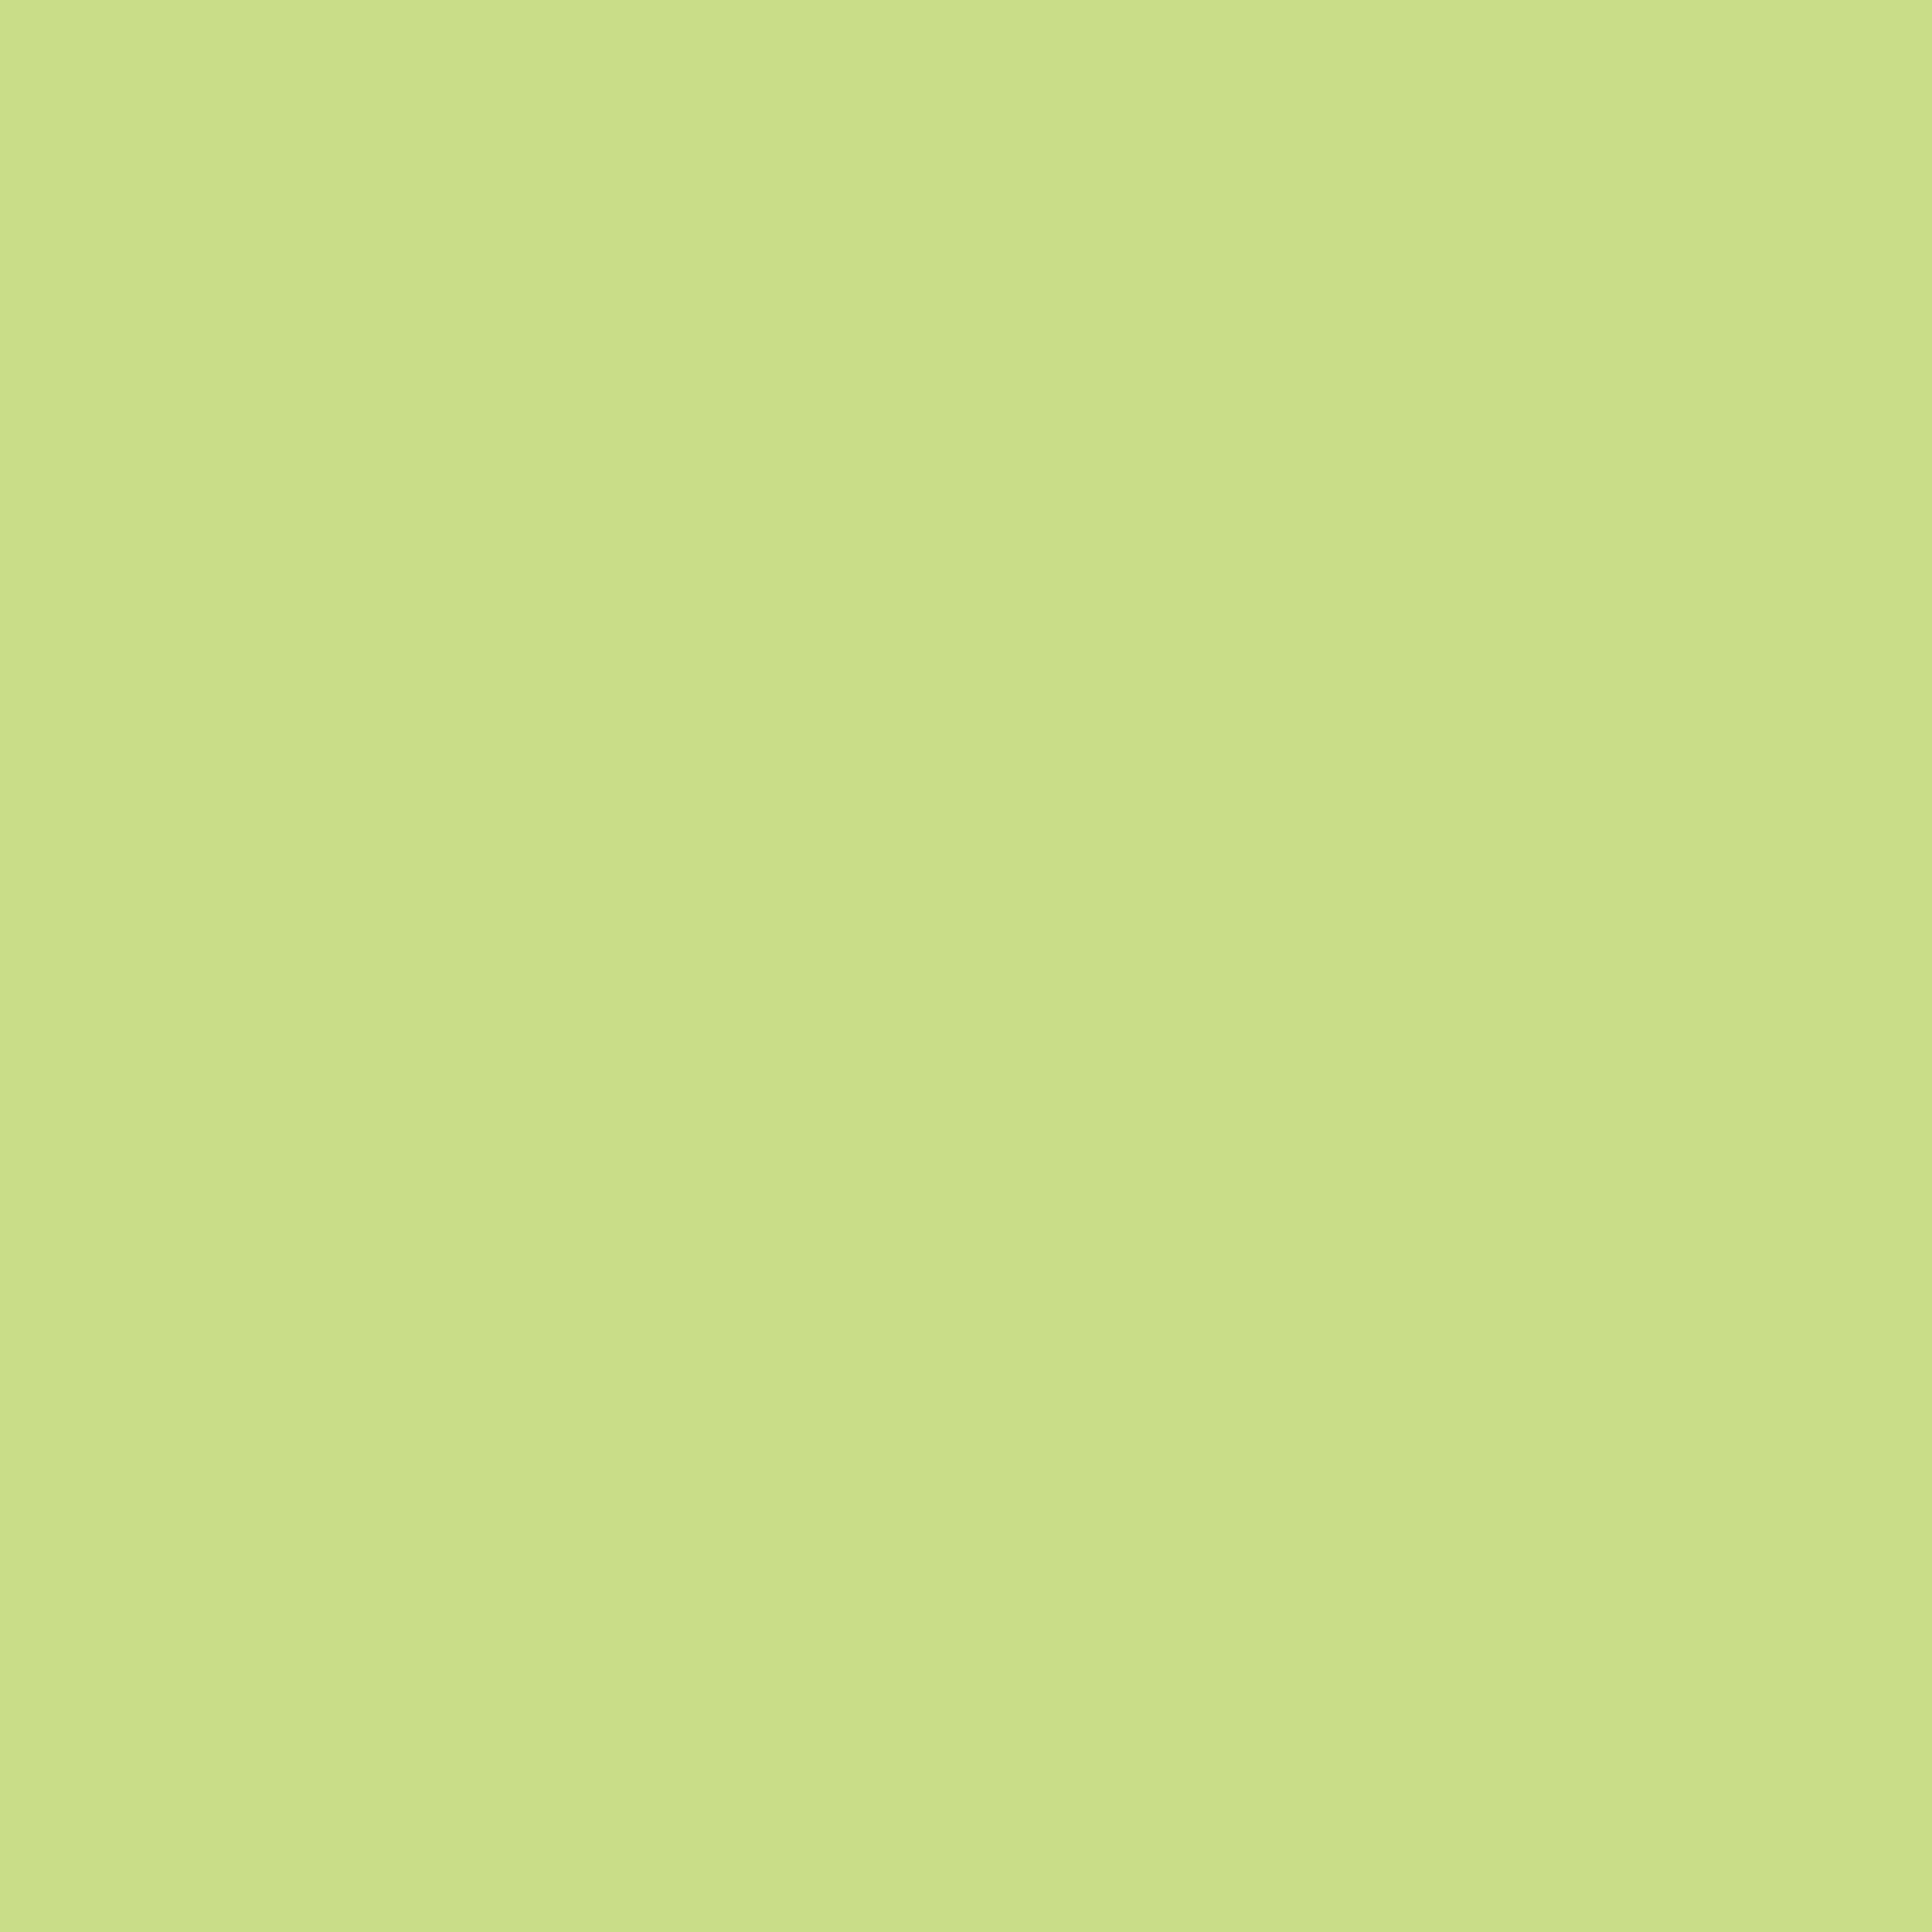 2732x2732 Medium Spring Bud Solid Color Background